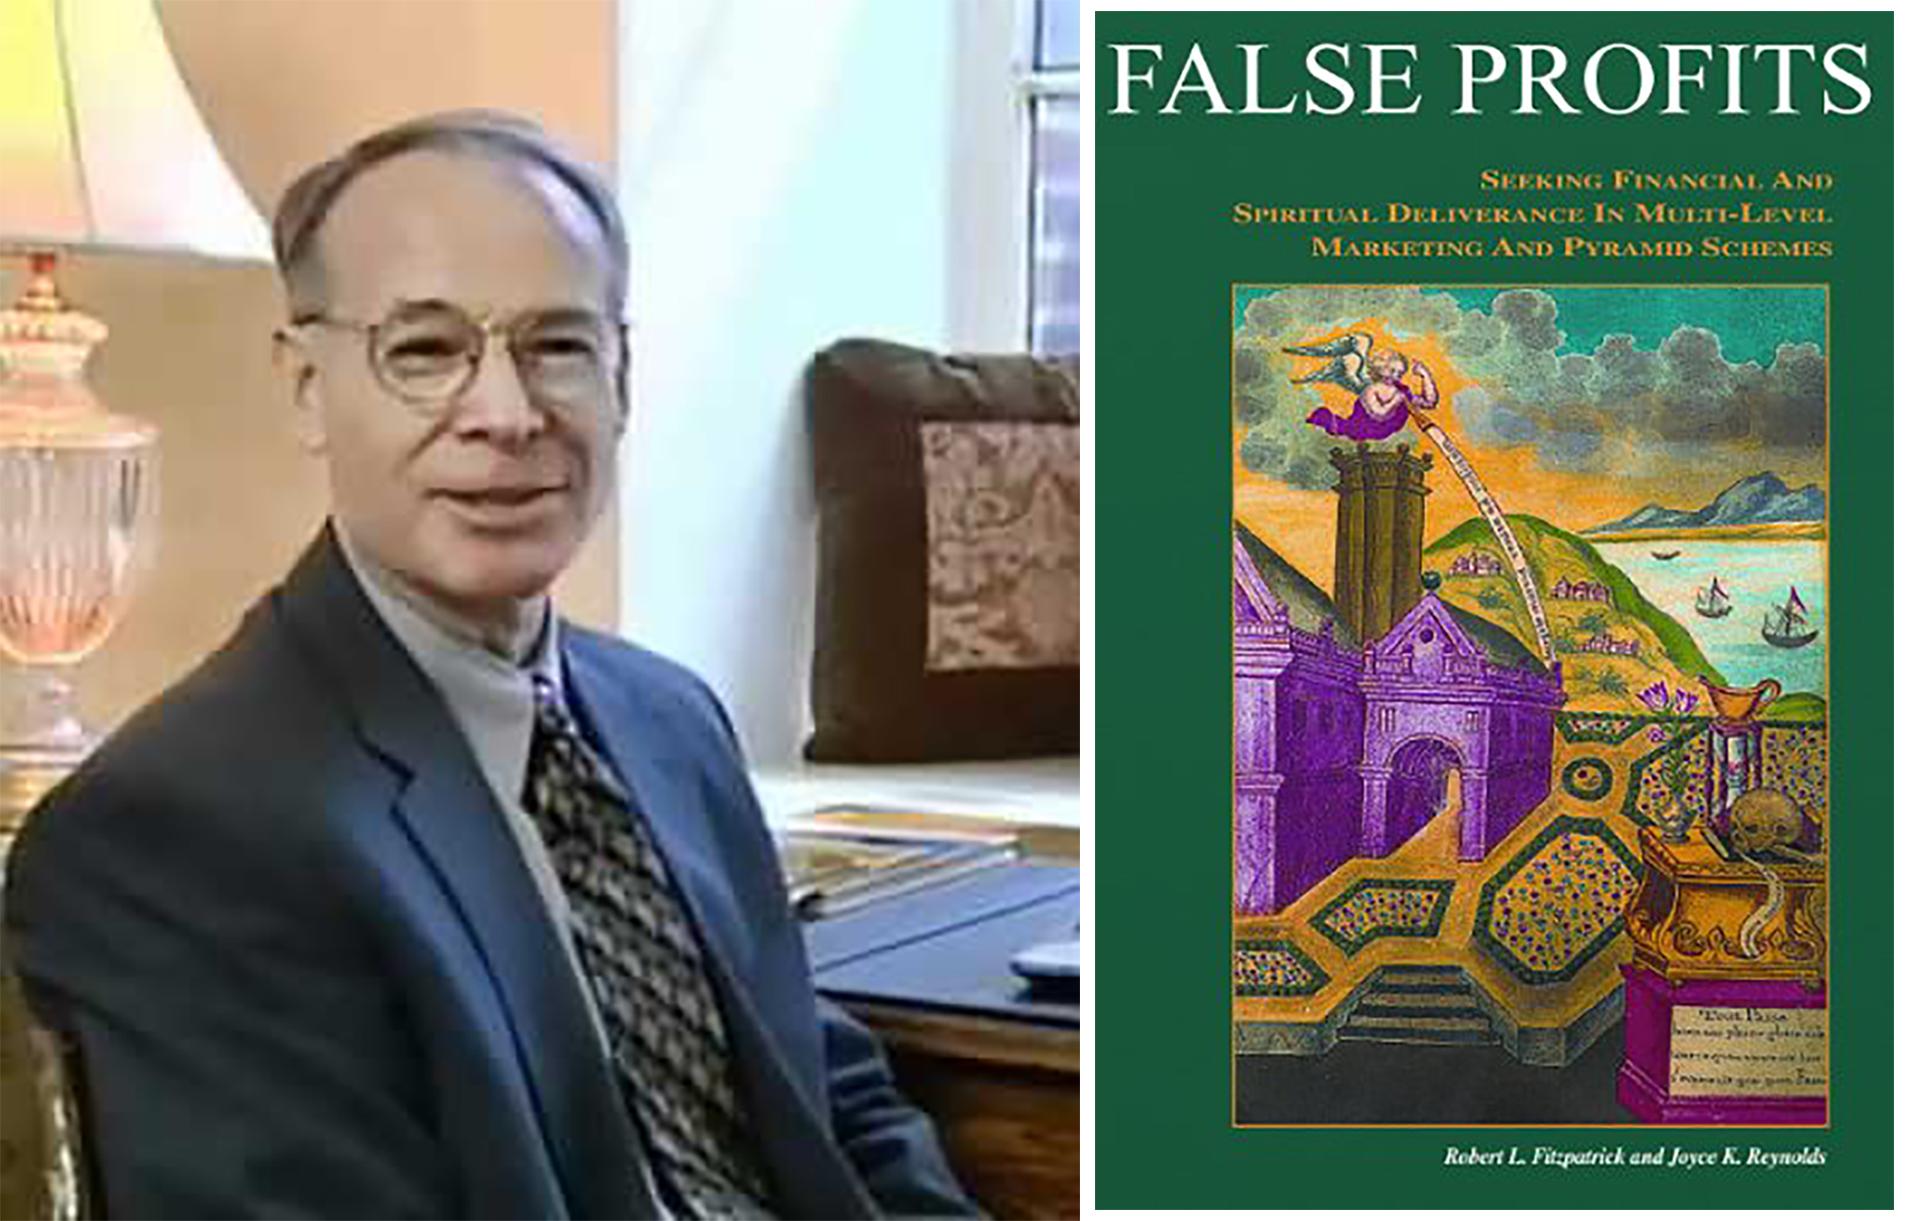 Robert FitzPatrick, presidente de Pyramid Scheme Alert y autor de False Profits: Seeking Financial and Spiritual Deliverance in Multi-Level Marketing and Pyramid Schemes.